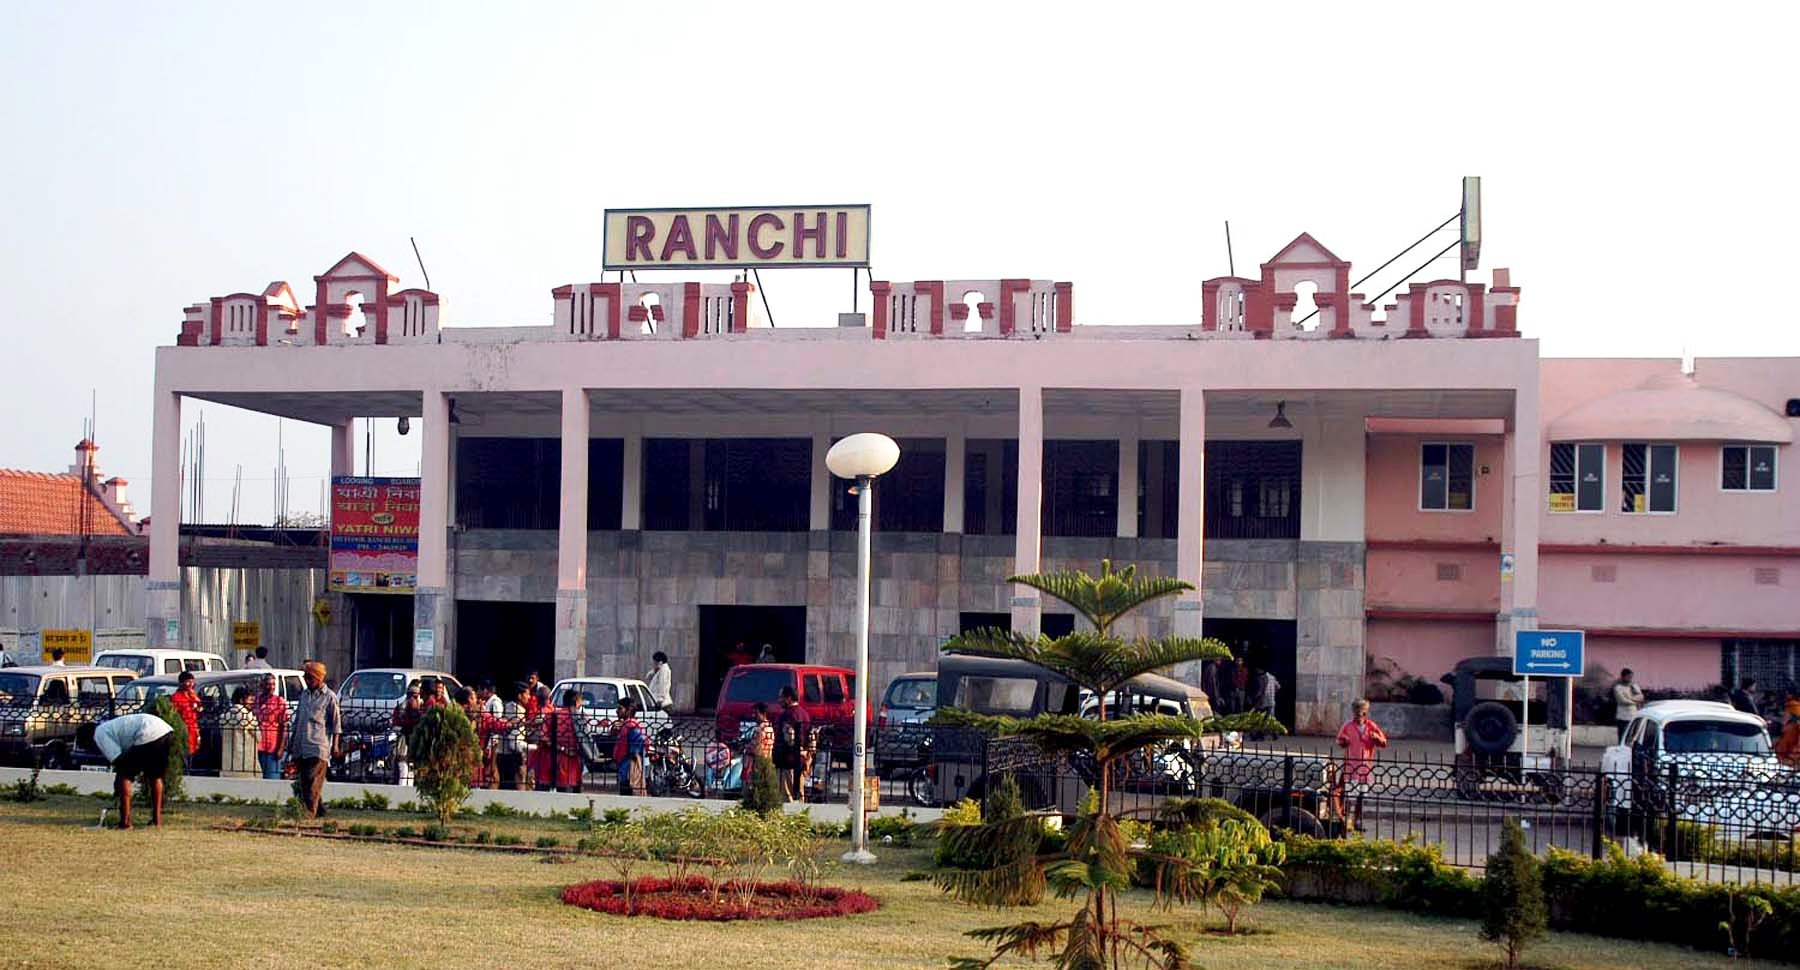 Safe Packers and Movers Services from Mumbai Pune Navi Mumbai to Ranchi Jamshedpur Bhubaneswar Bokaro to Mumbai Pune Navi Mumbai